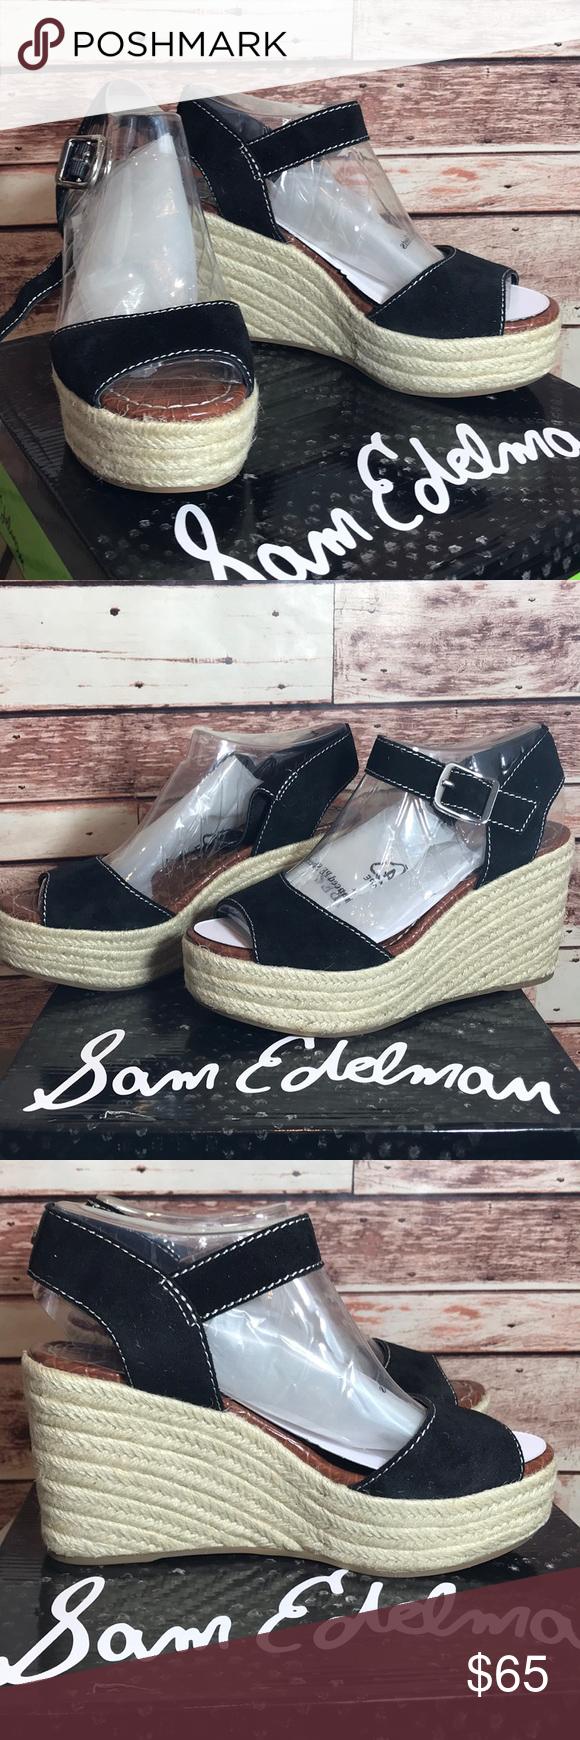 "ade5ea31ea4b4d Sam Edelman Espadrilles Dimitree Wedge Sandals NWT BRAND NEW IN THE BOX Sam  Edelman ""Dimitree"" Black Suede Size US - 7M UK - 5 EUR - 37 Heal height is  ..."